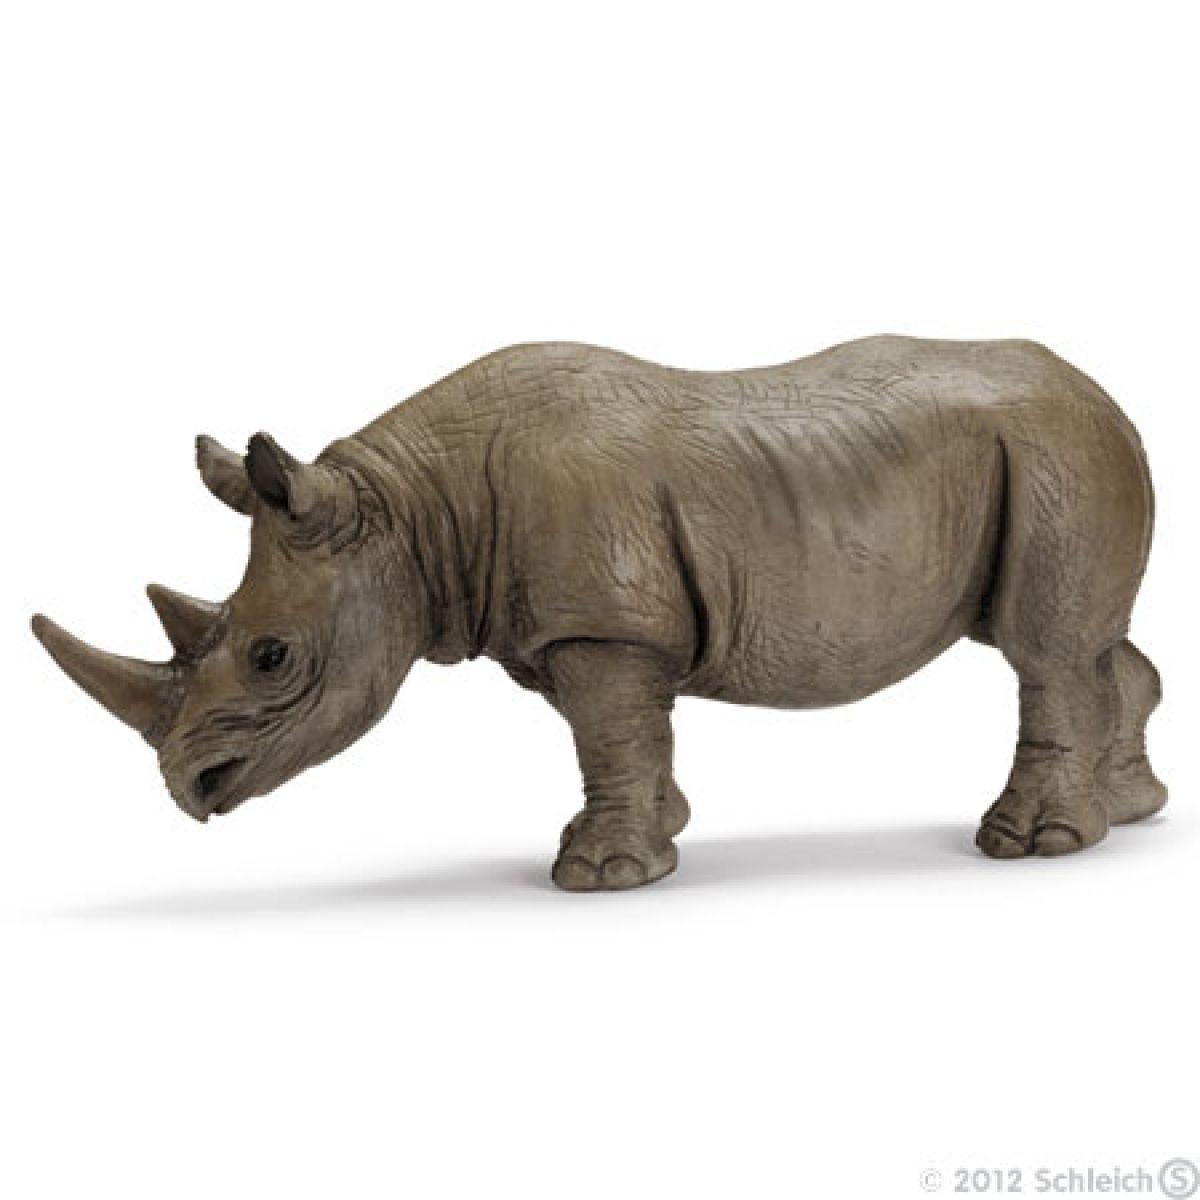 Schleich 14193 Nosorožec dlouhorohý samec